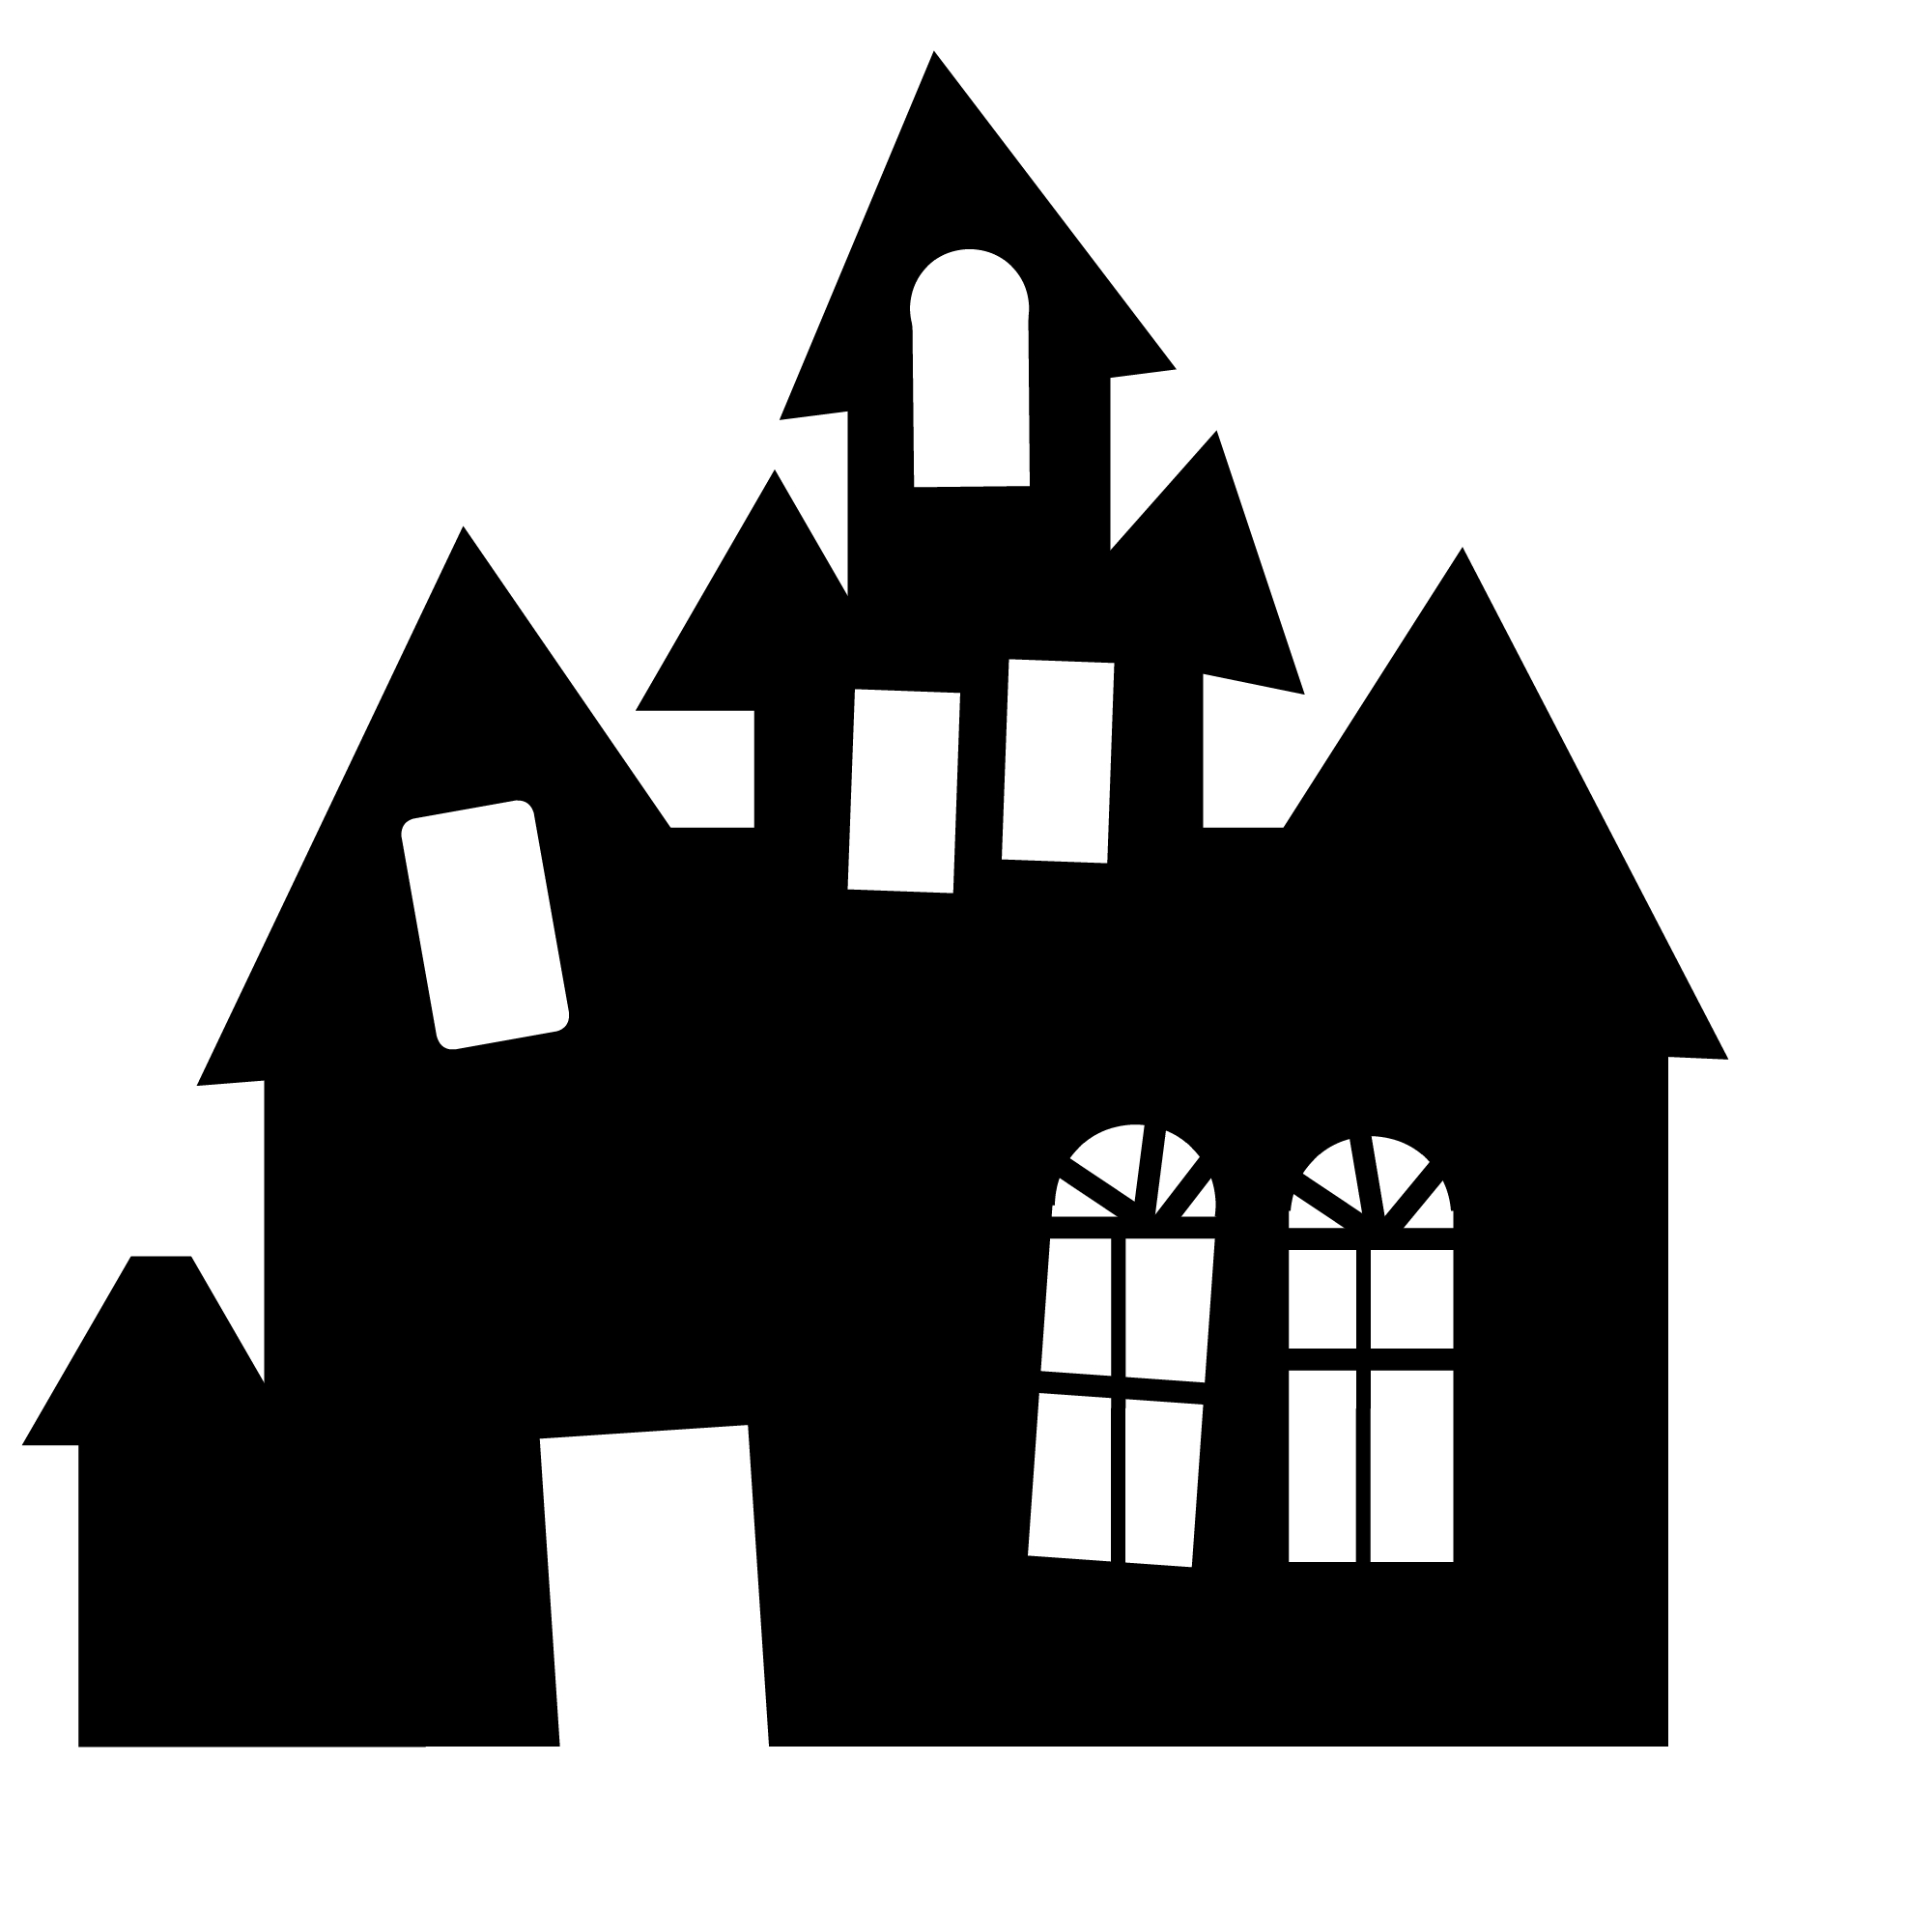 Hauntedhousesilhouette